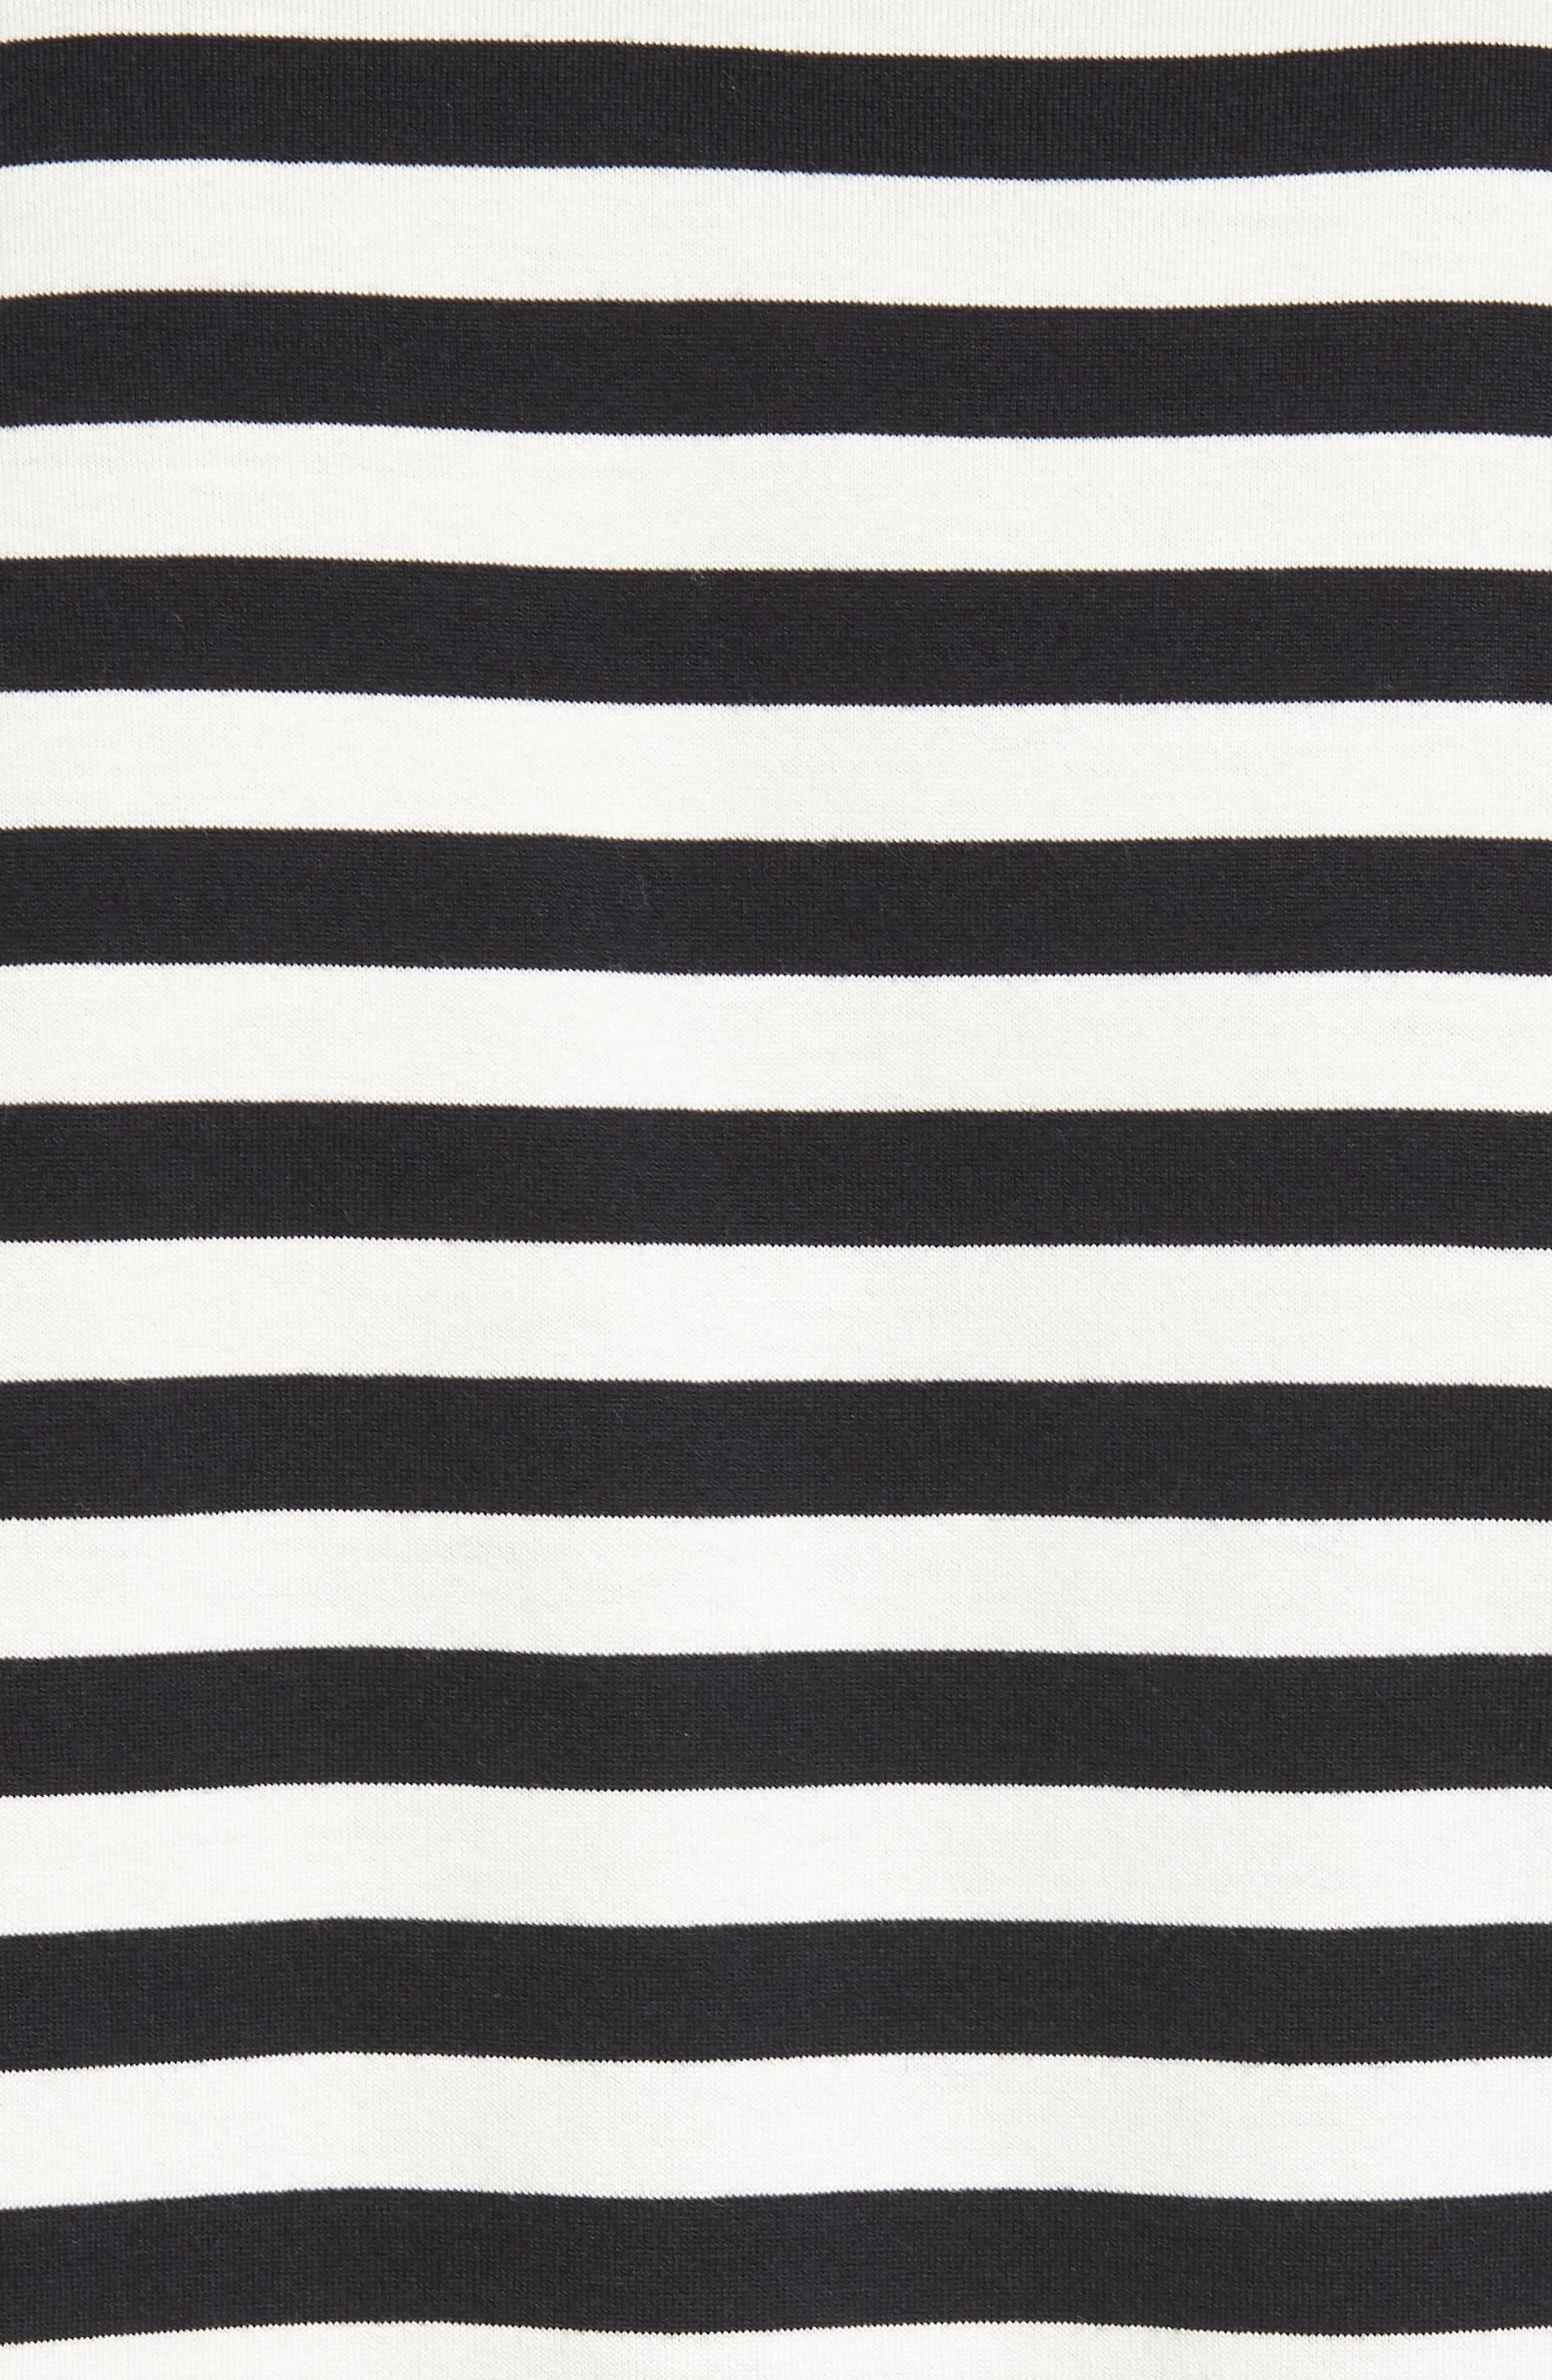 Slim Fit Stripe Tank,                             Alternate thumbnail 5, color,                             New Coastal/ Leche